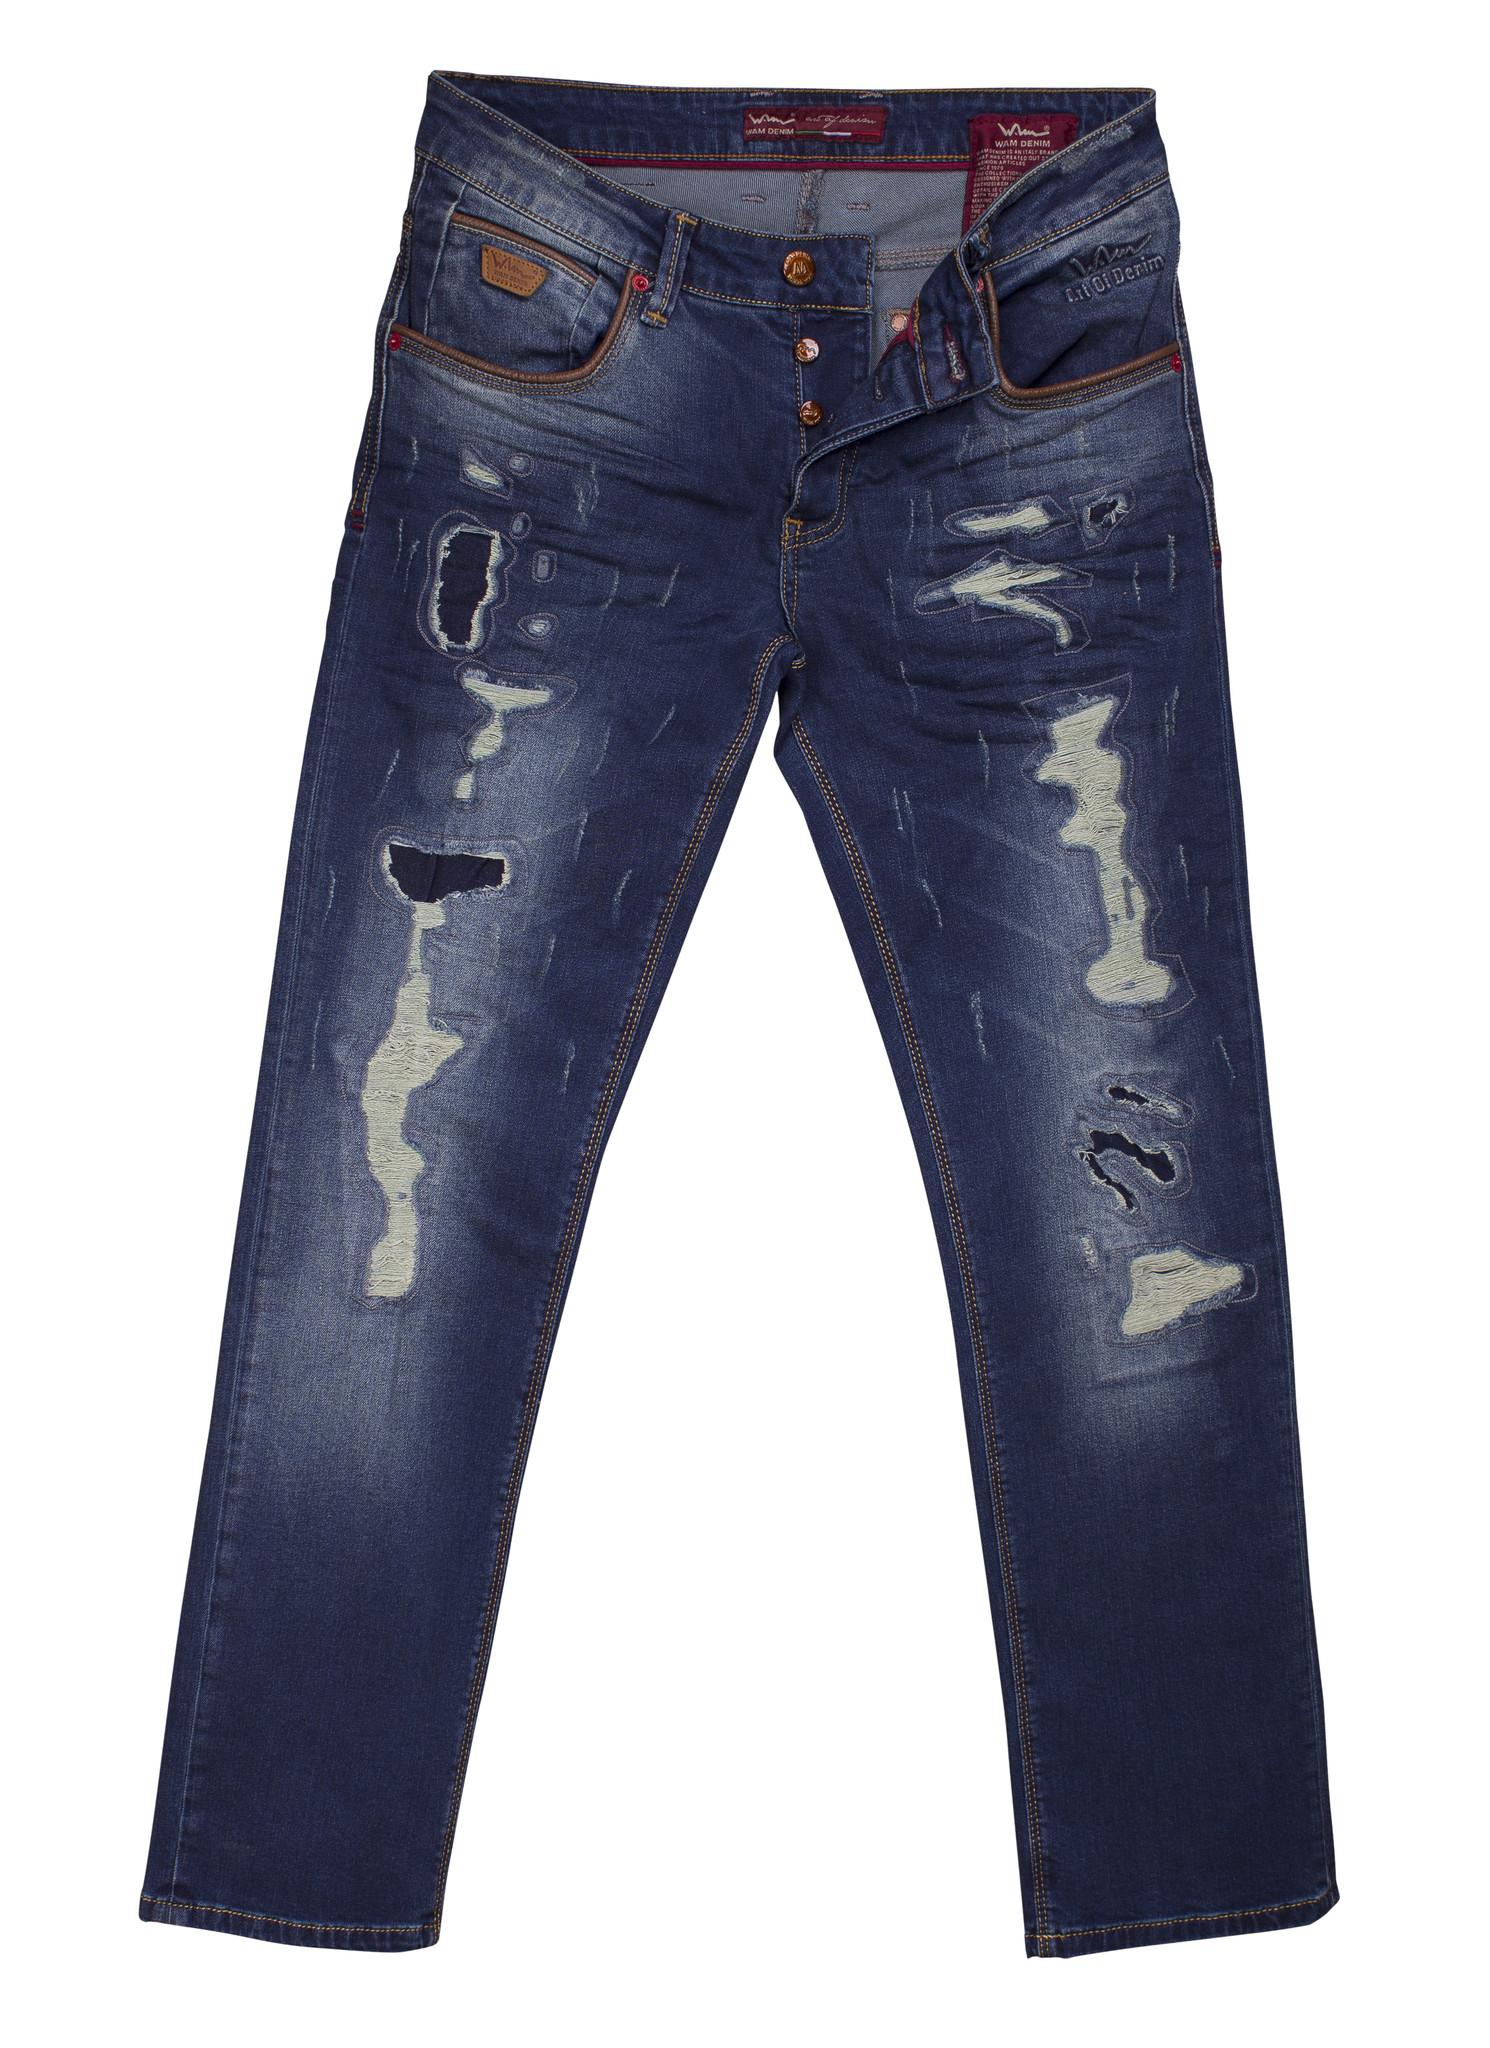 Wam Denim Jeans Tennesee Dark Blue